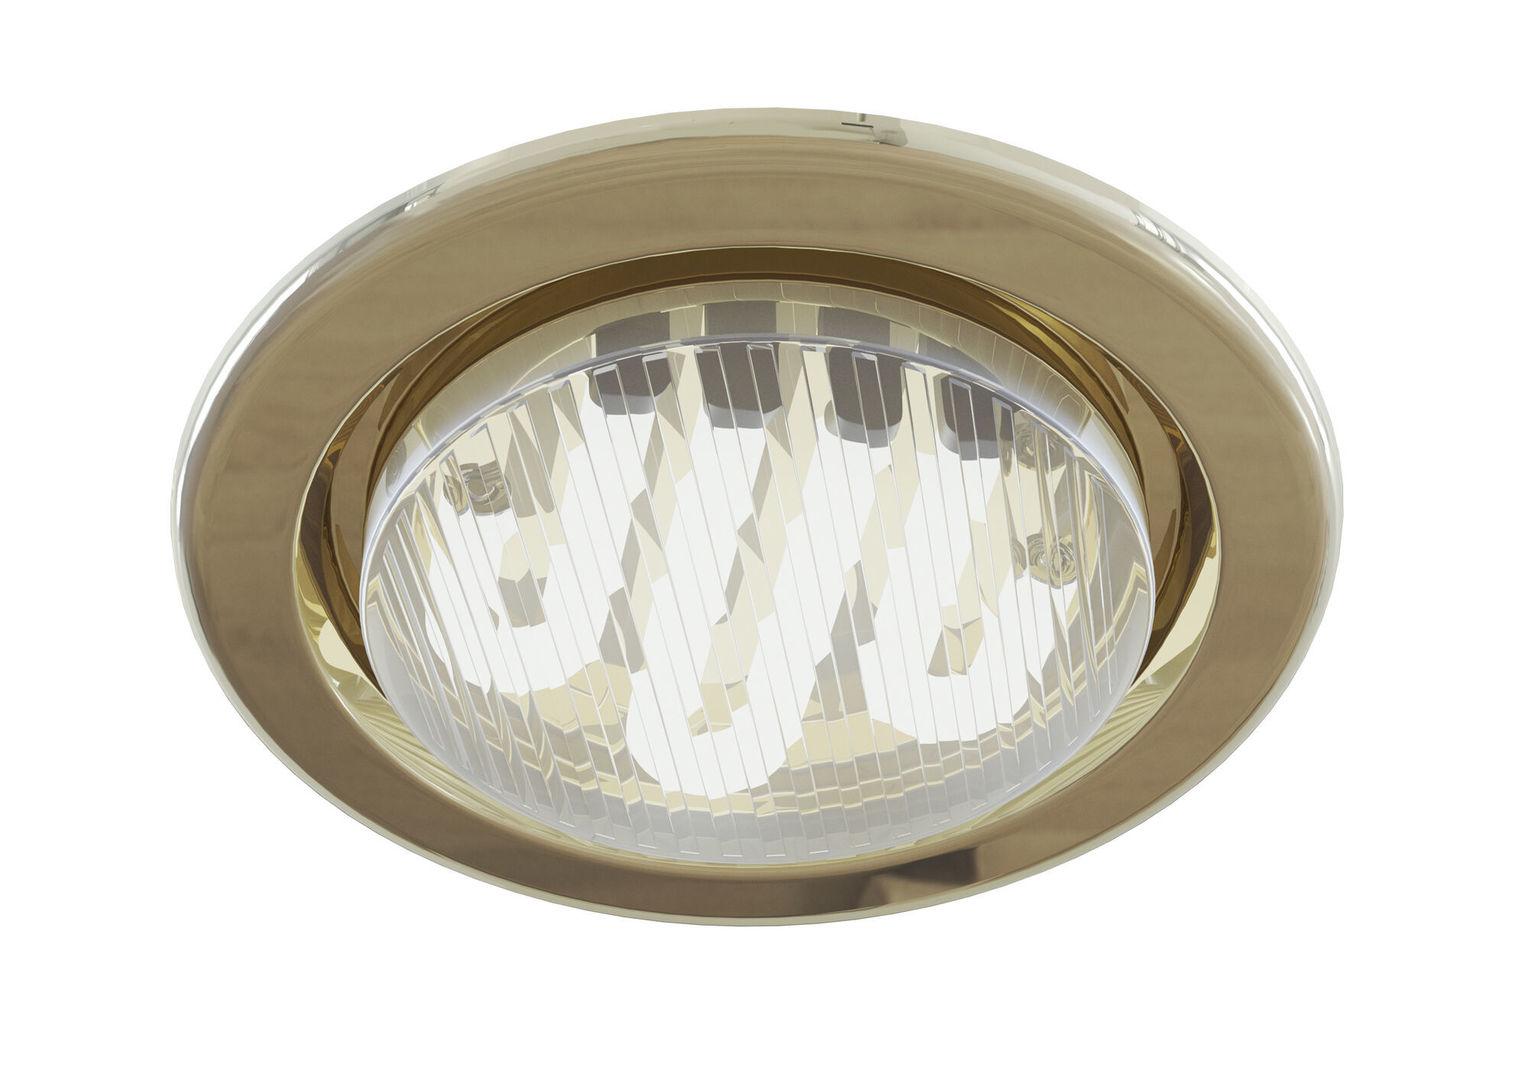 Corp de iluminat încorporat Maytoni Metal Modern DL293-01-G